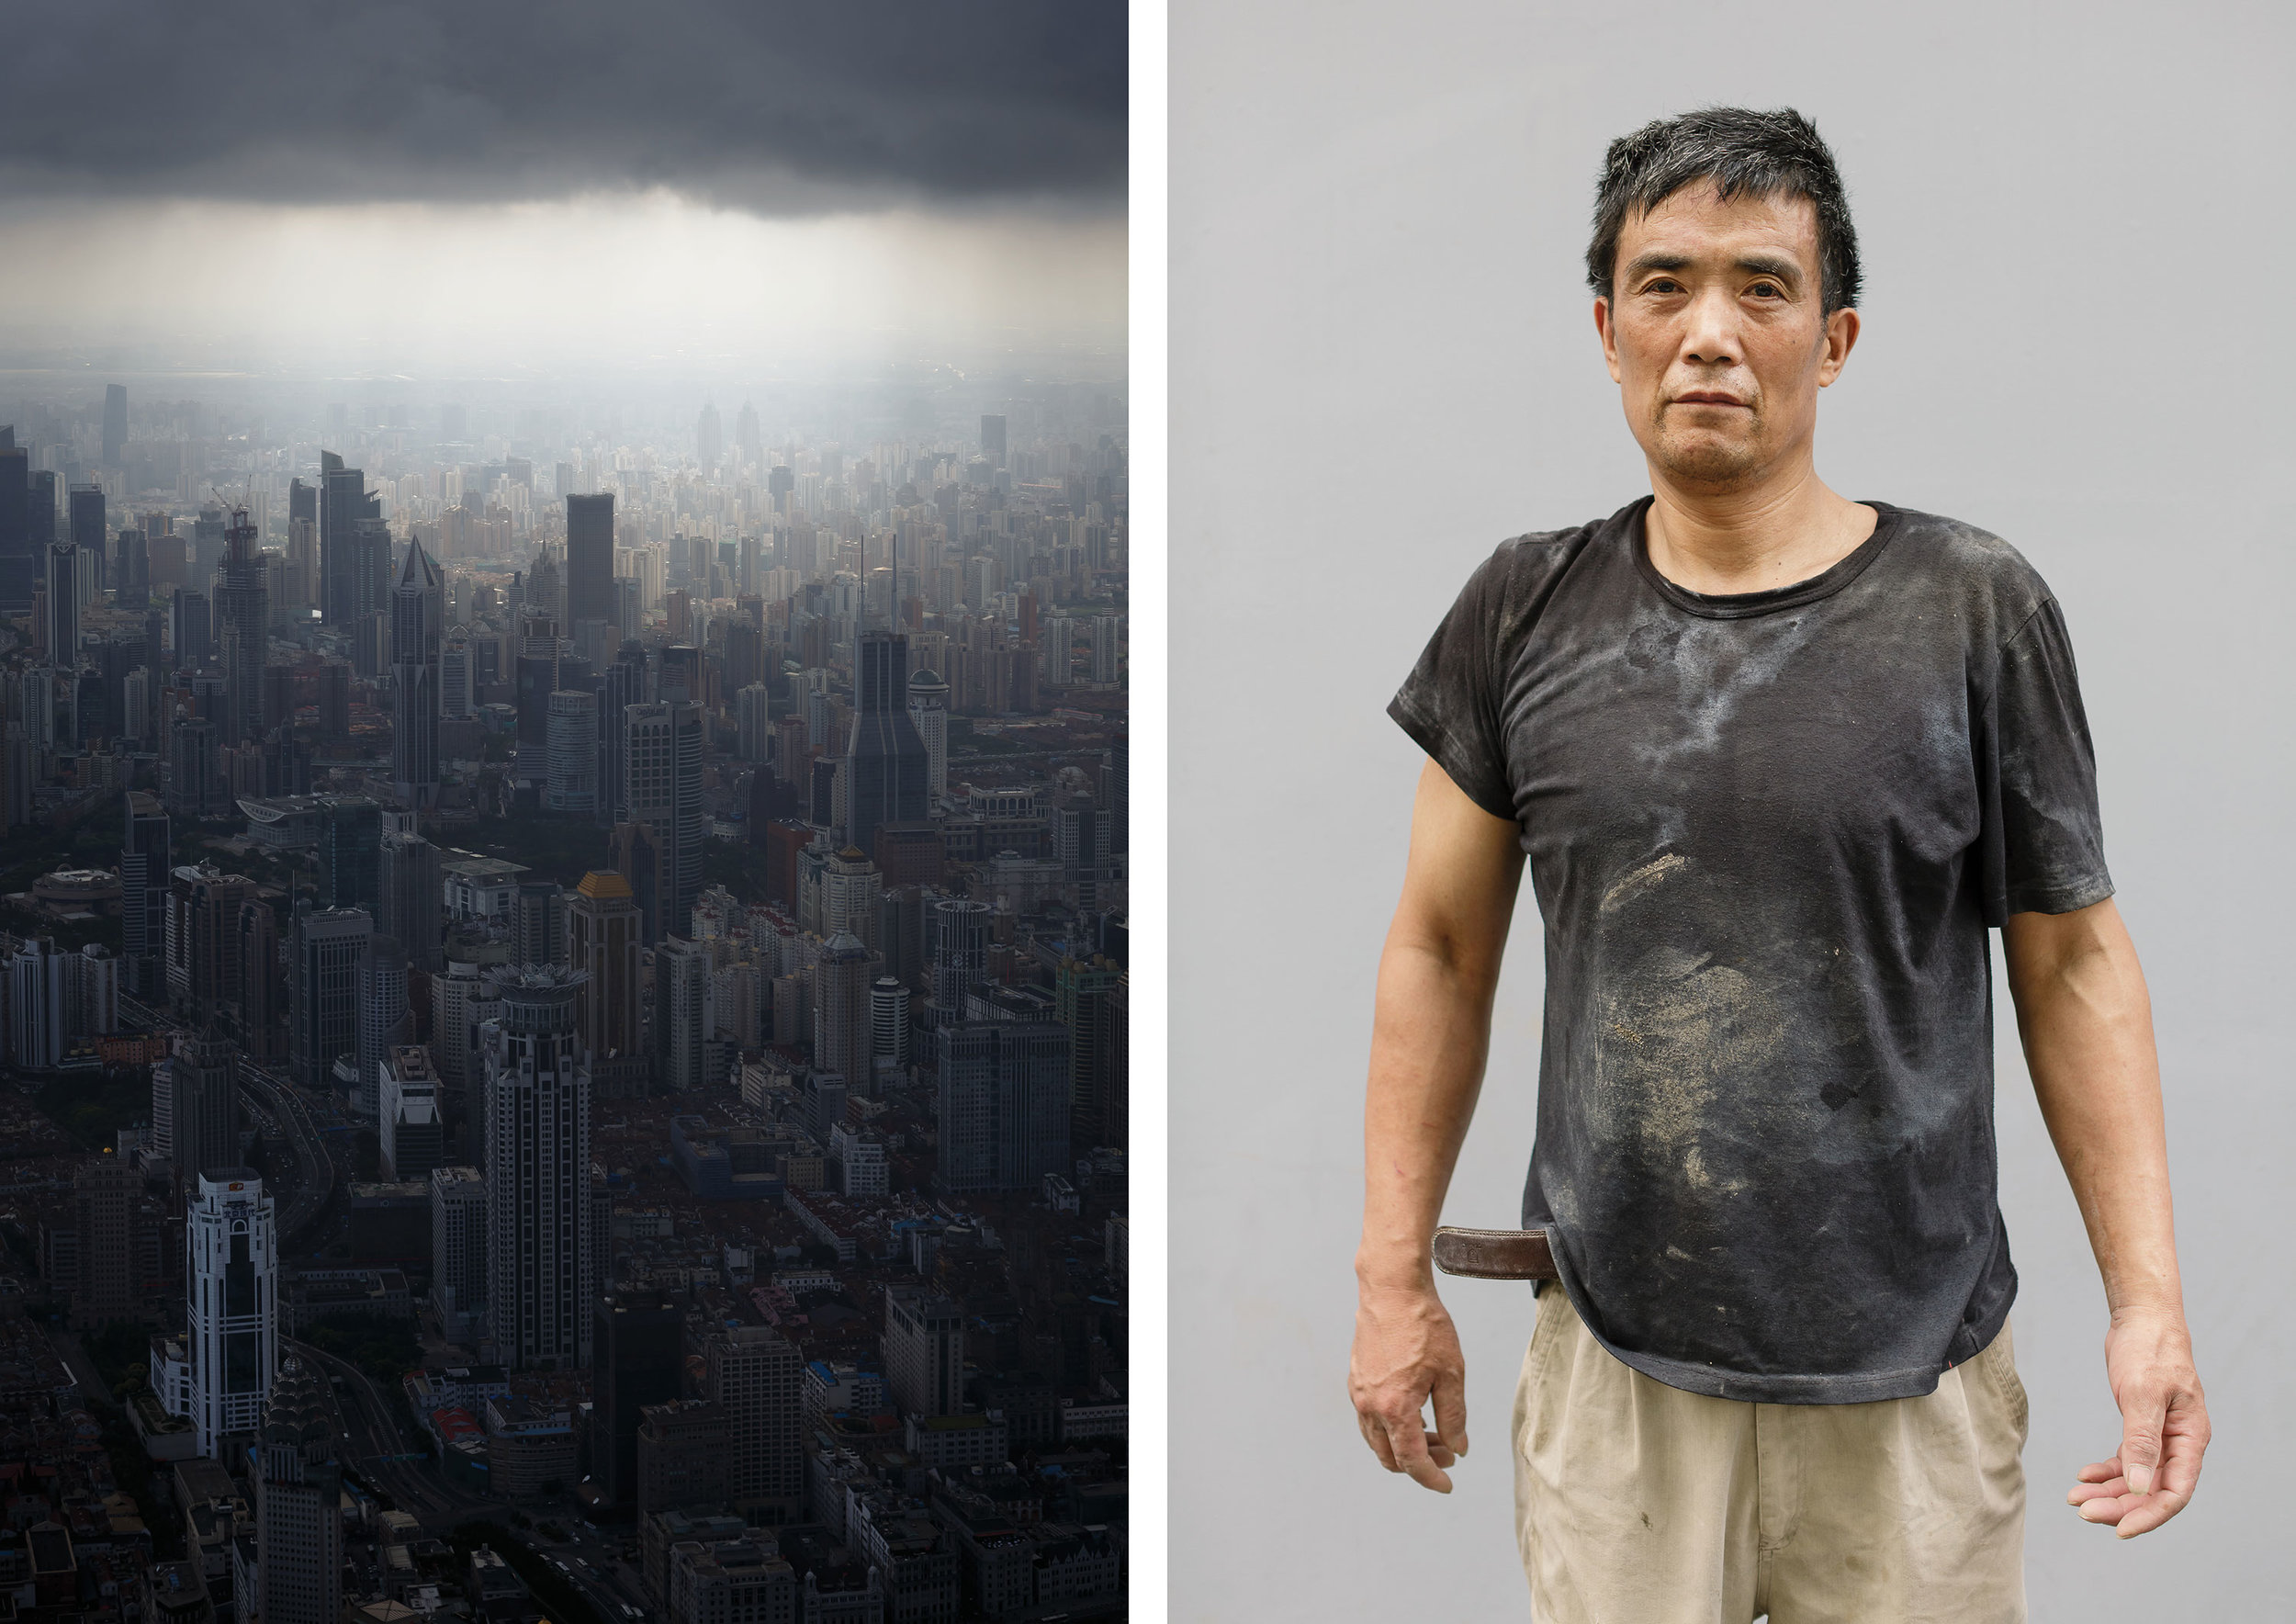 Shanghai_Tower-workers-and-building6.jpg